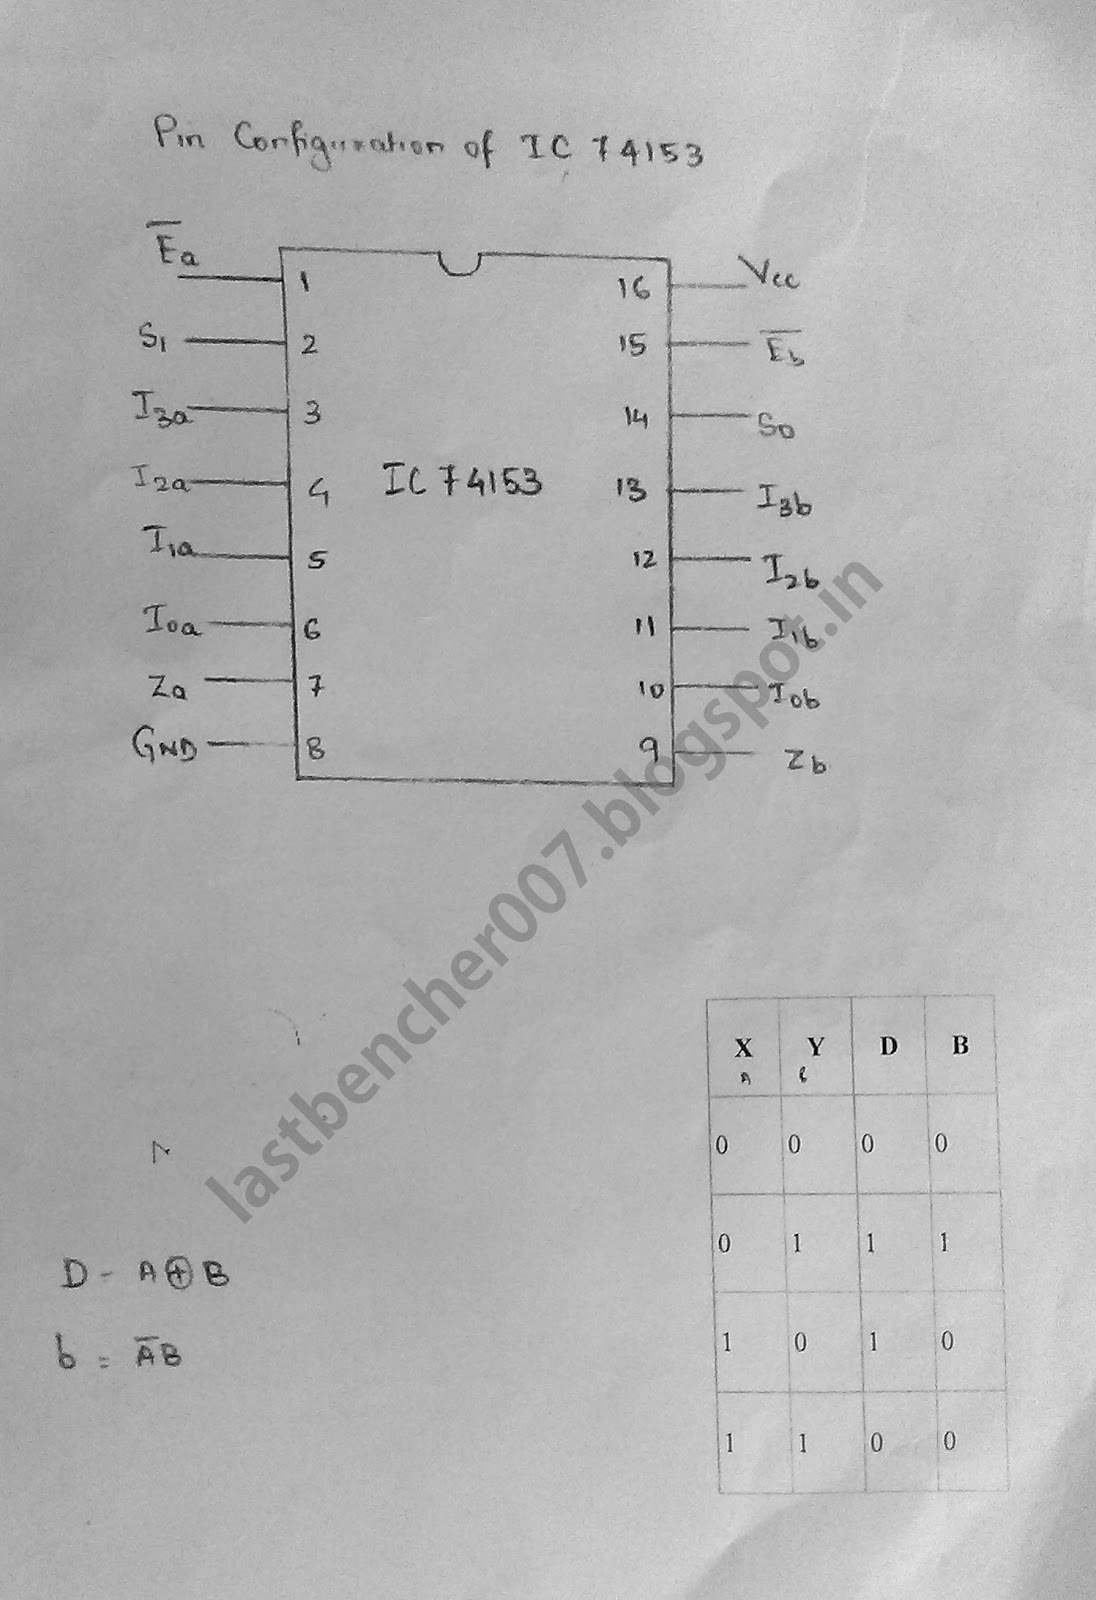 Subtractor Using 41 Mux The Last Bencher General Block Diagram Of Multiplexer